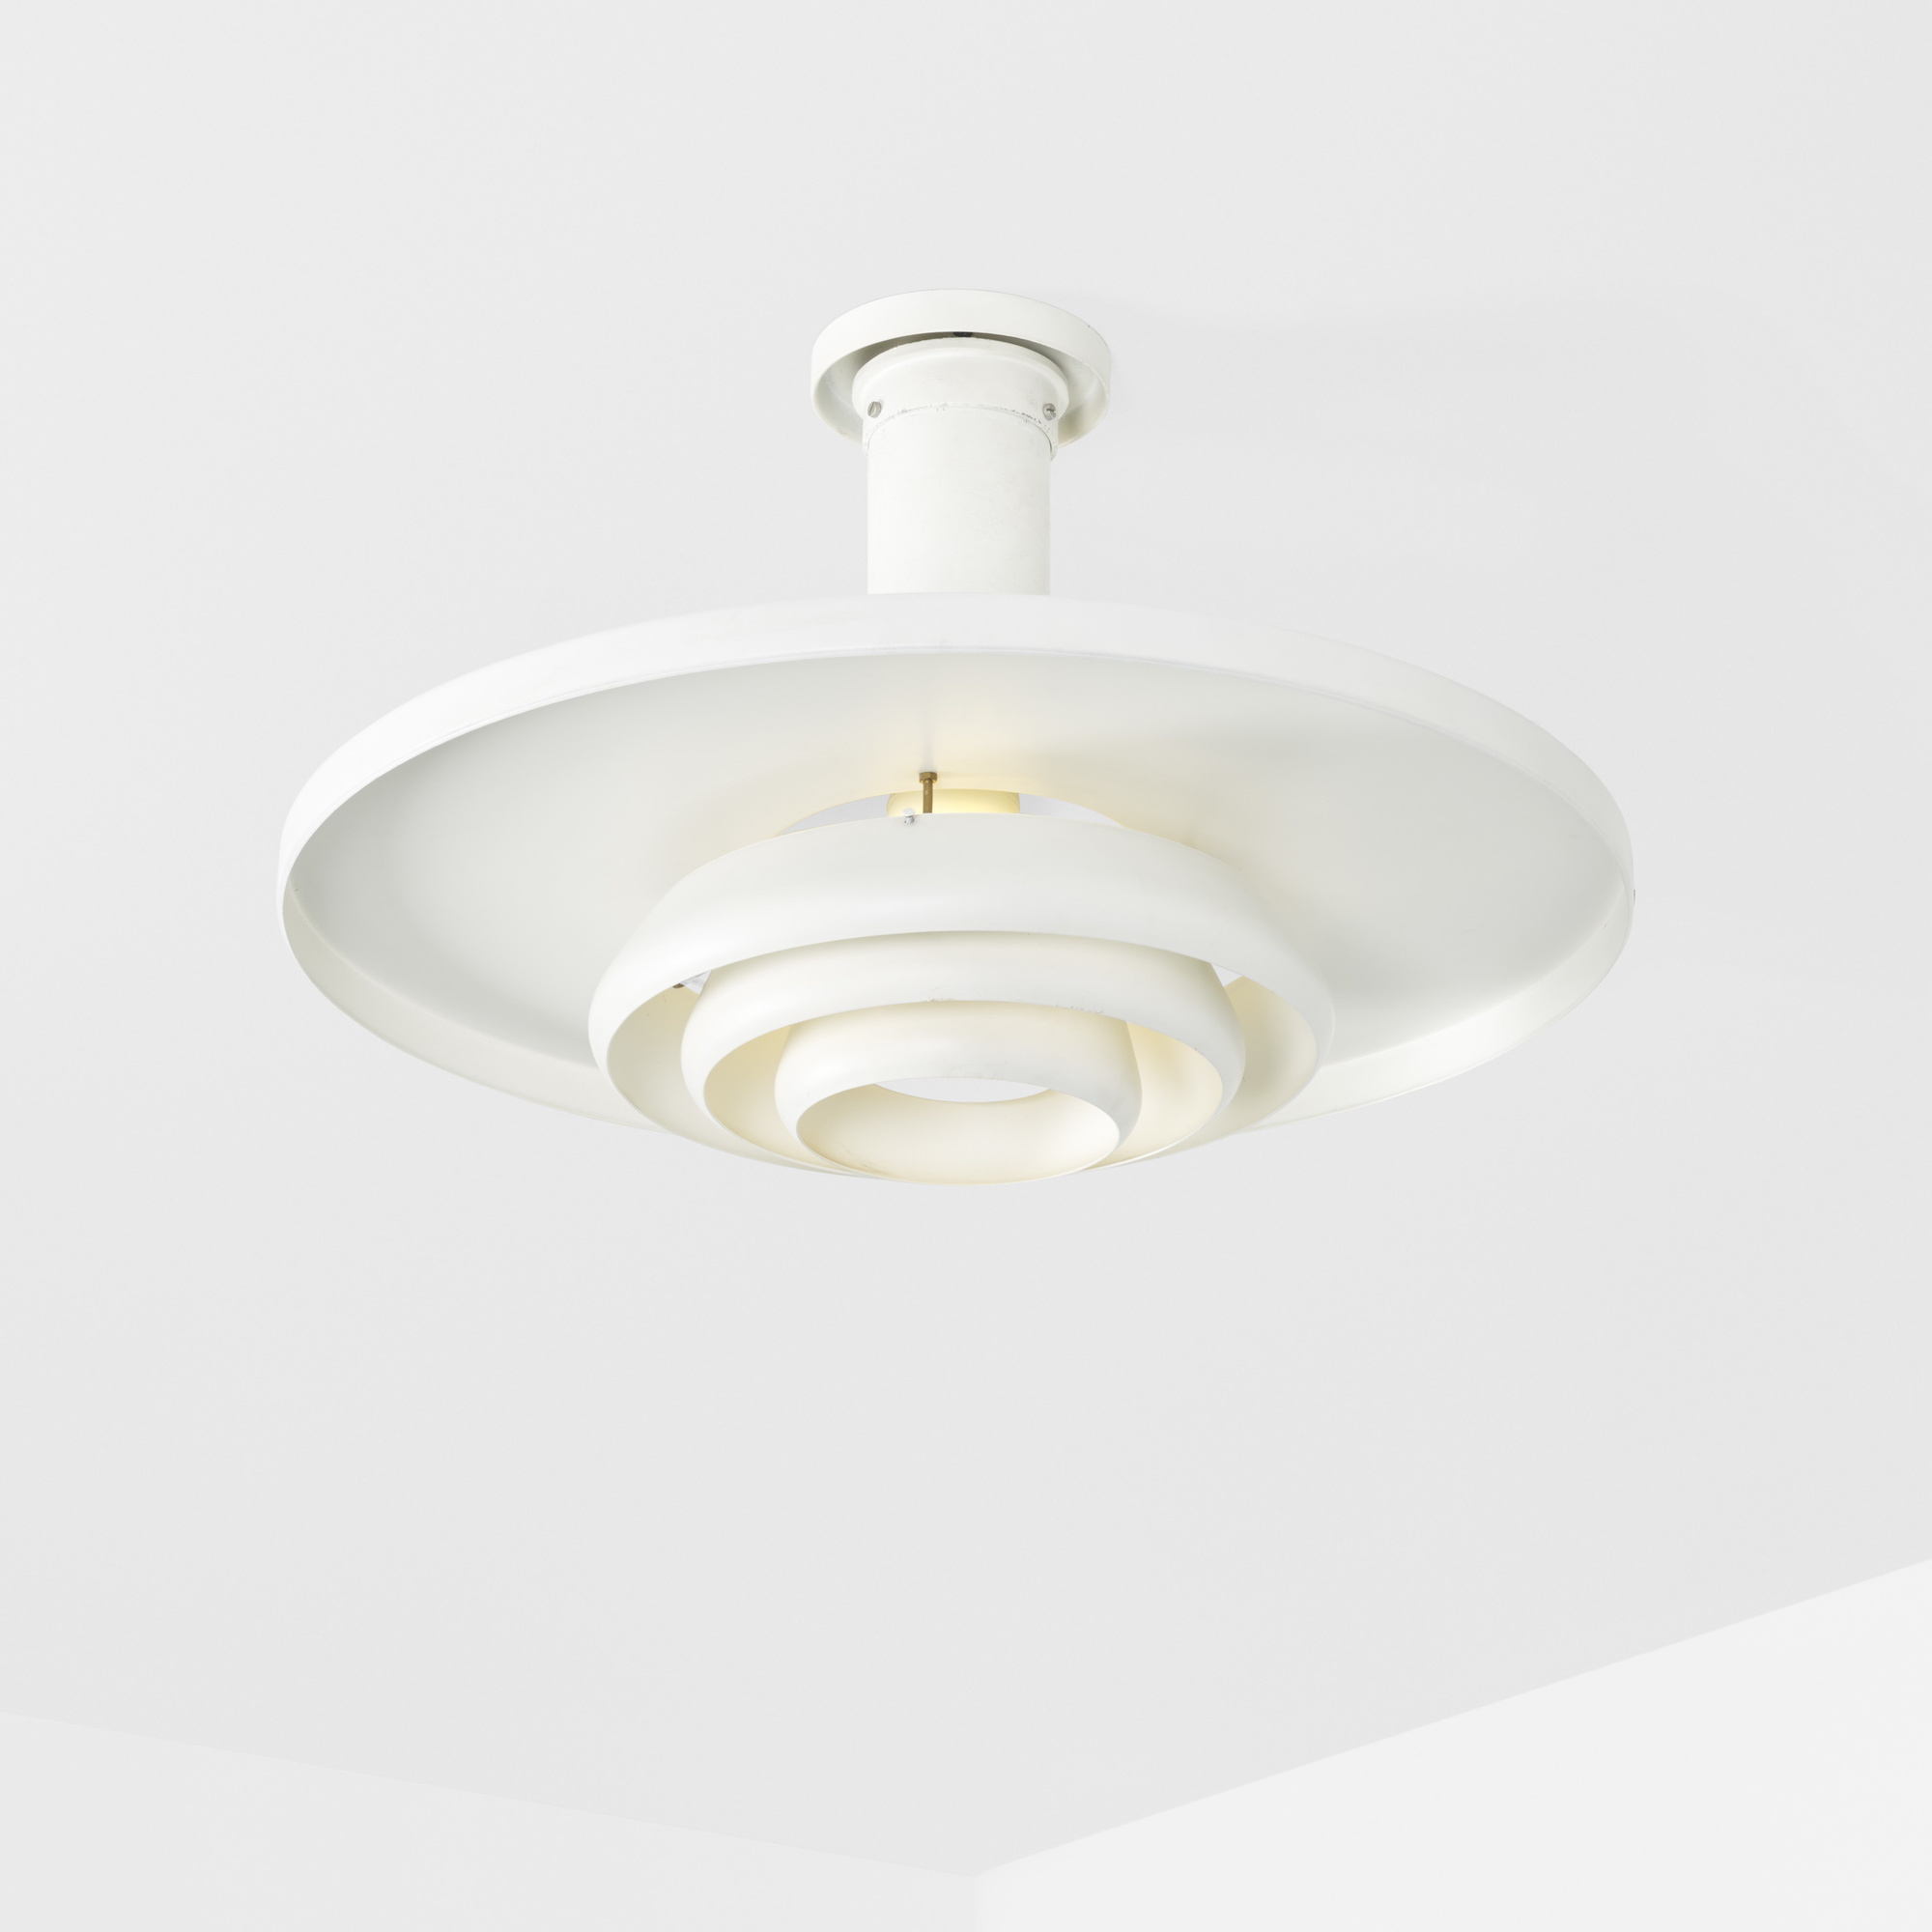 181 alvar aalto flying saucer ceiling lamp model a337 181 alvar aalto flying saucer ceiling lamp model a337 1 of 2 arubaitofo Images